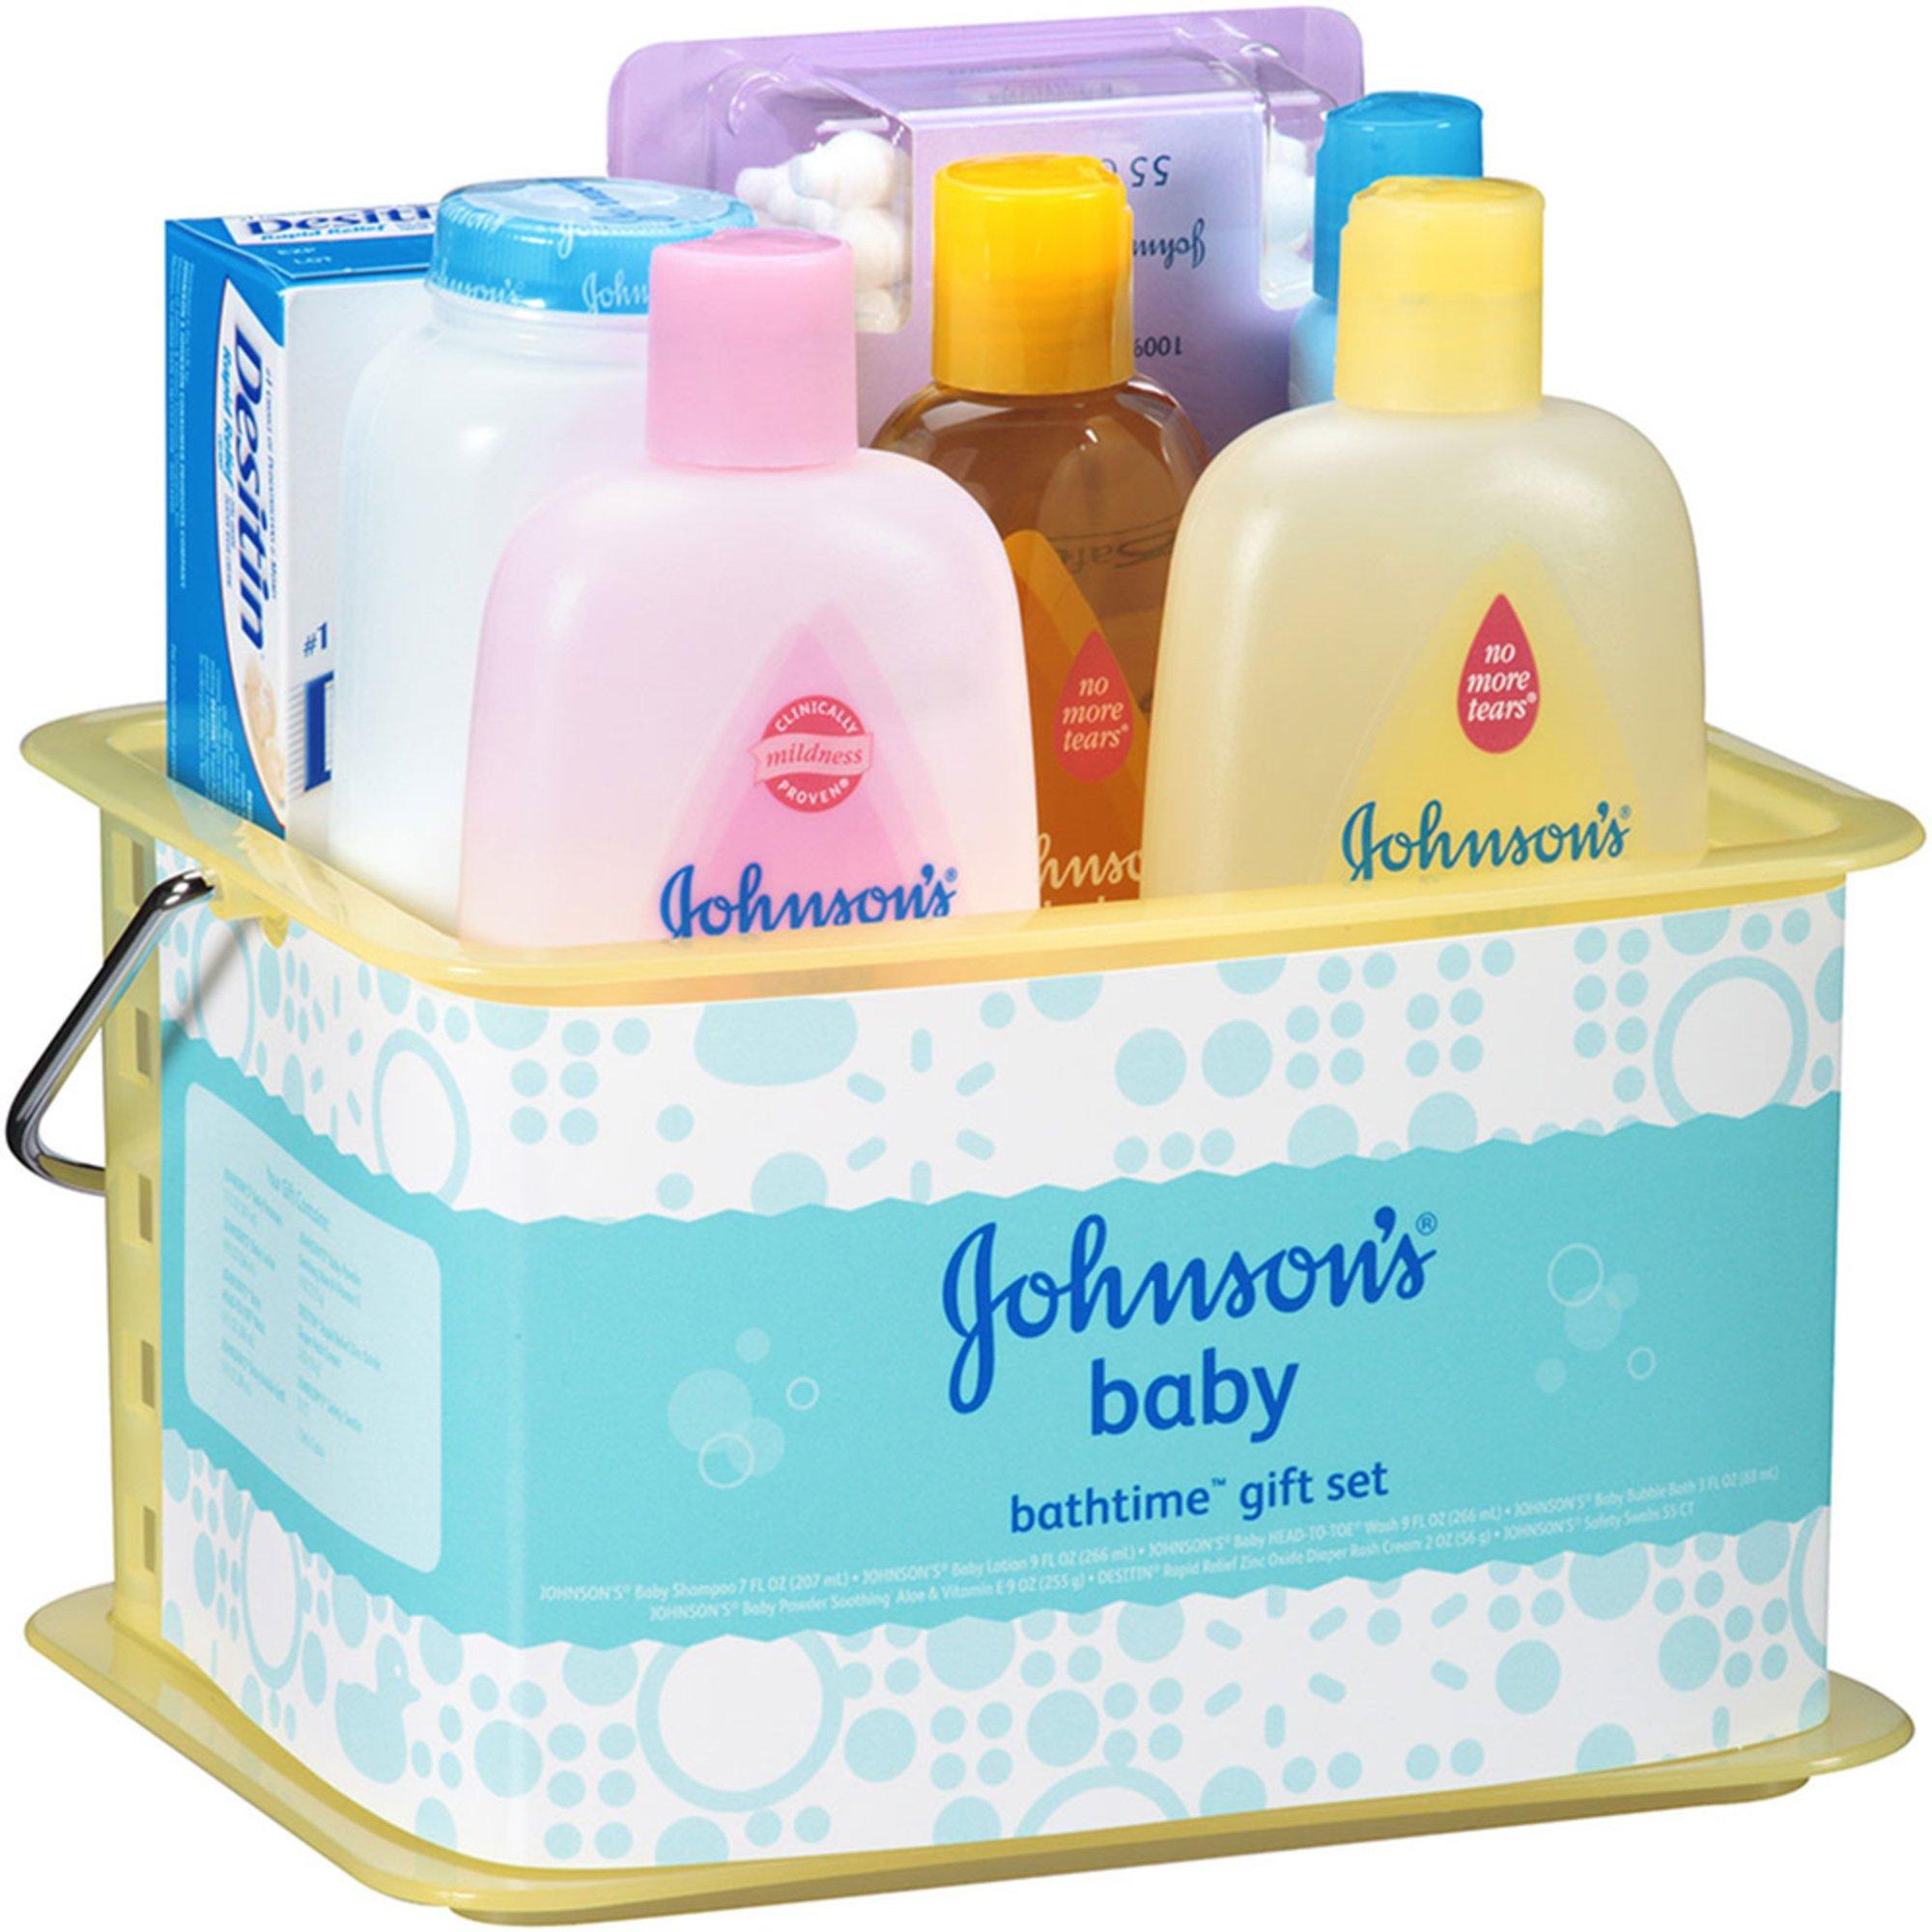 Baby Gift Sets Us : Johnson s baby bathtime gift set sets